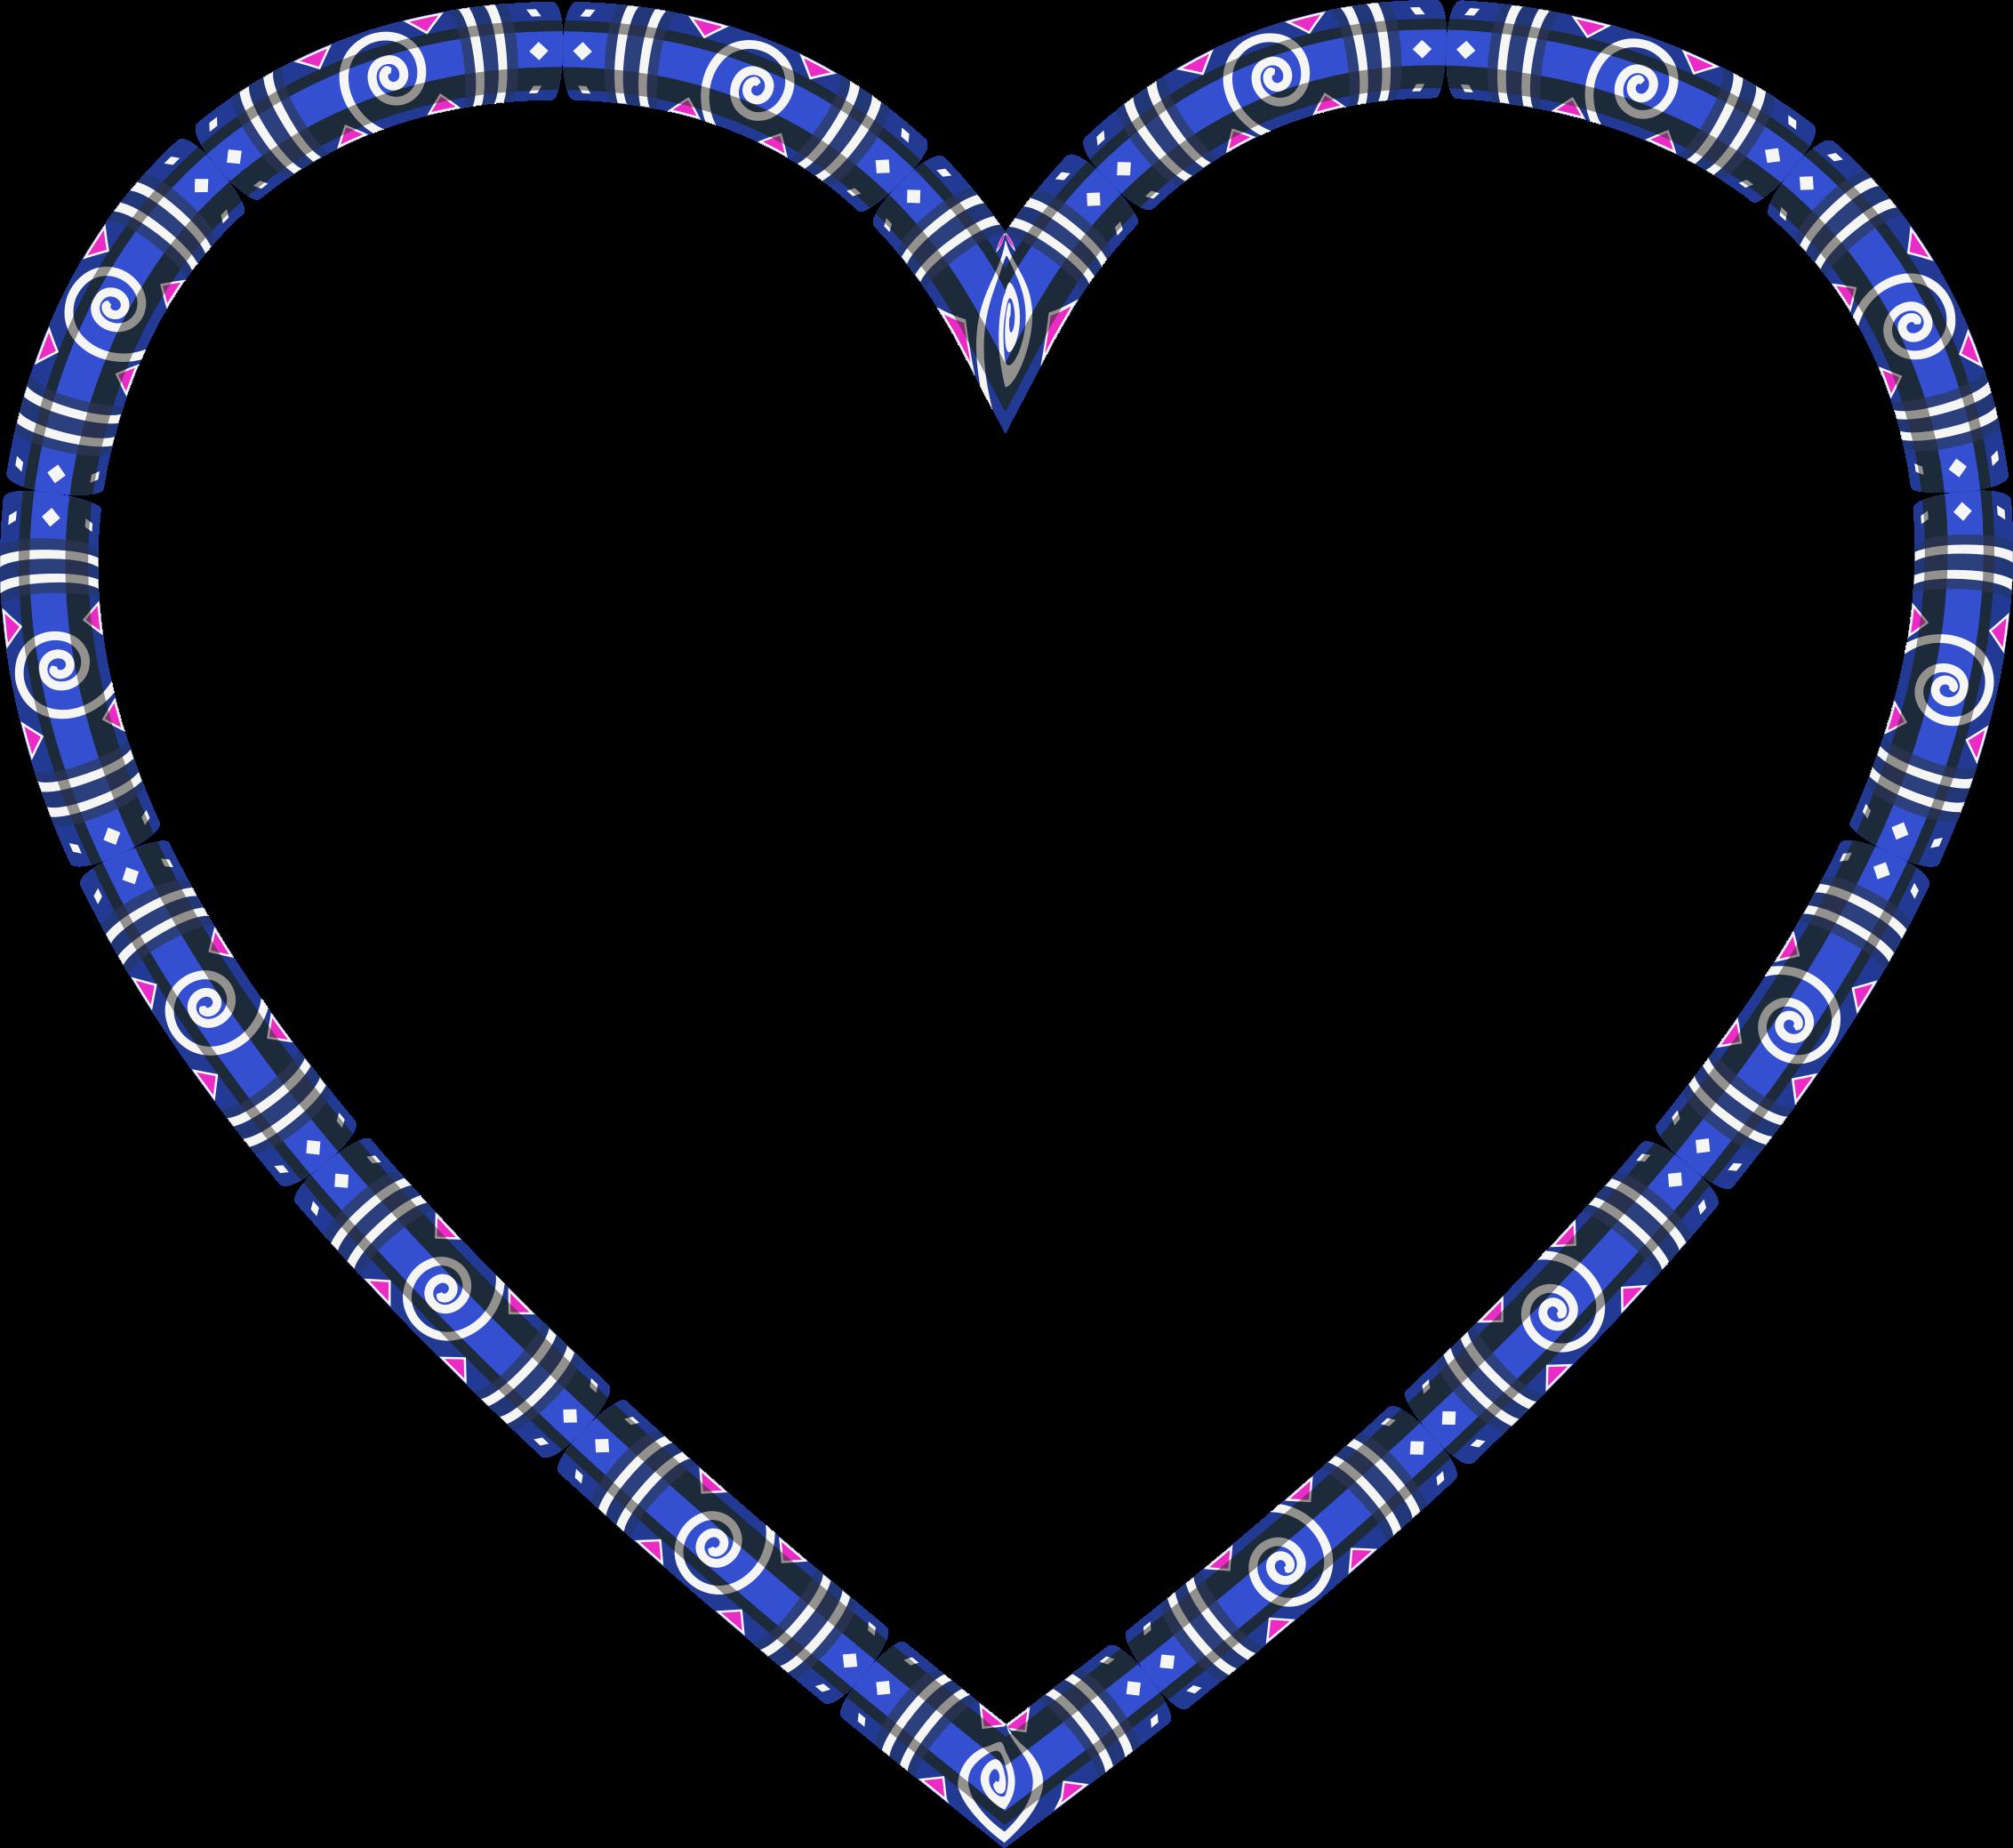 image stock Decorative heart frame variation. Heartbeat clipart.